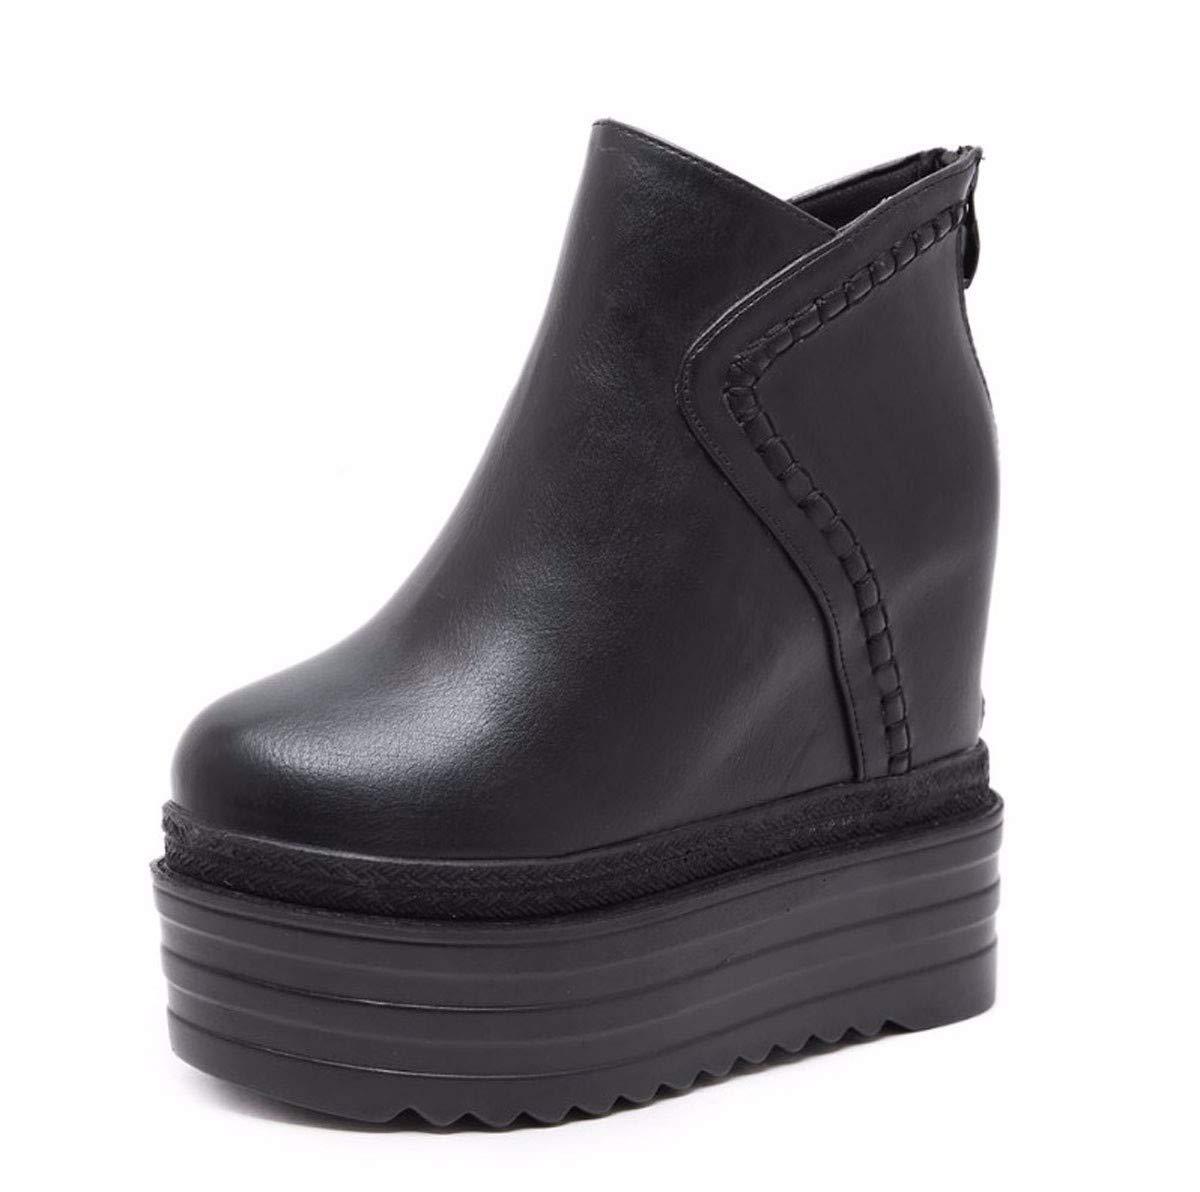 HBDLH Damenschuhe Mode Slope Ferse Mit Hohen 13Cm Kurze Stiefel Dicke Boden - Super - High - Heels Nachtclubs Hohe Stiefel.